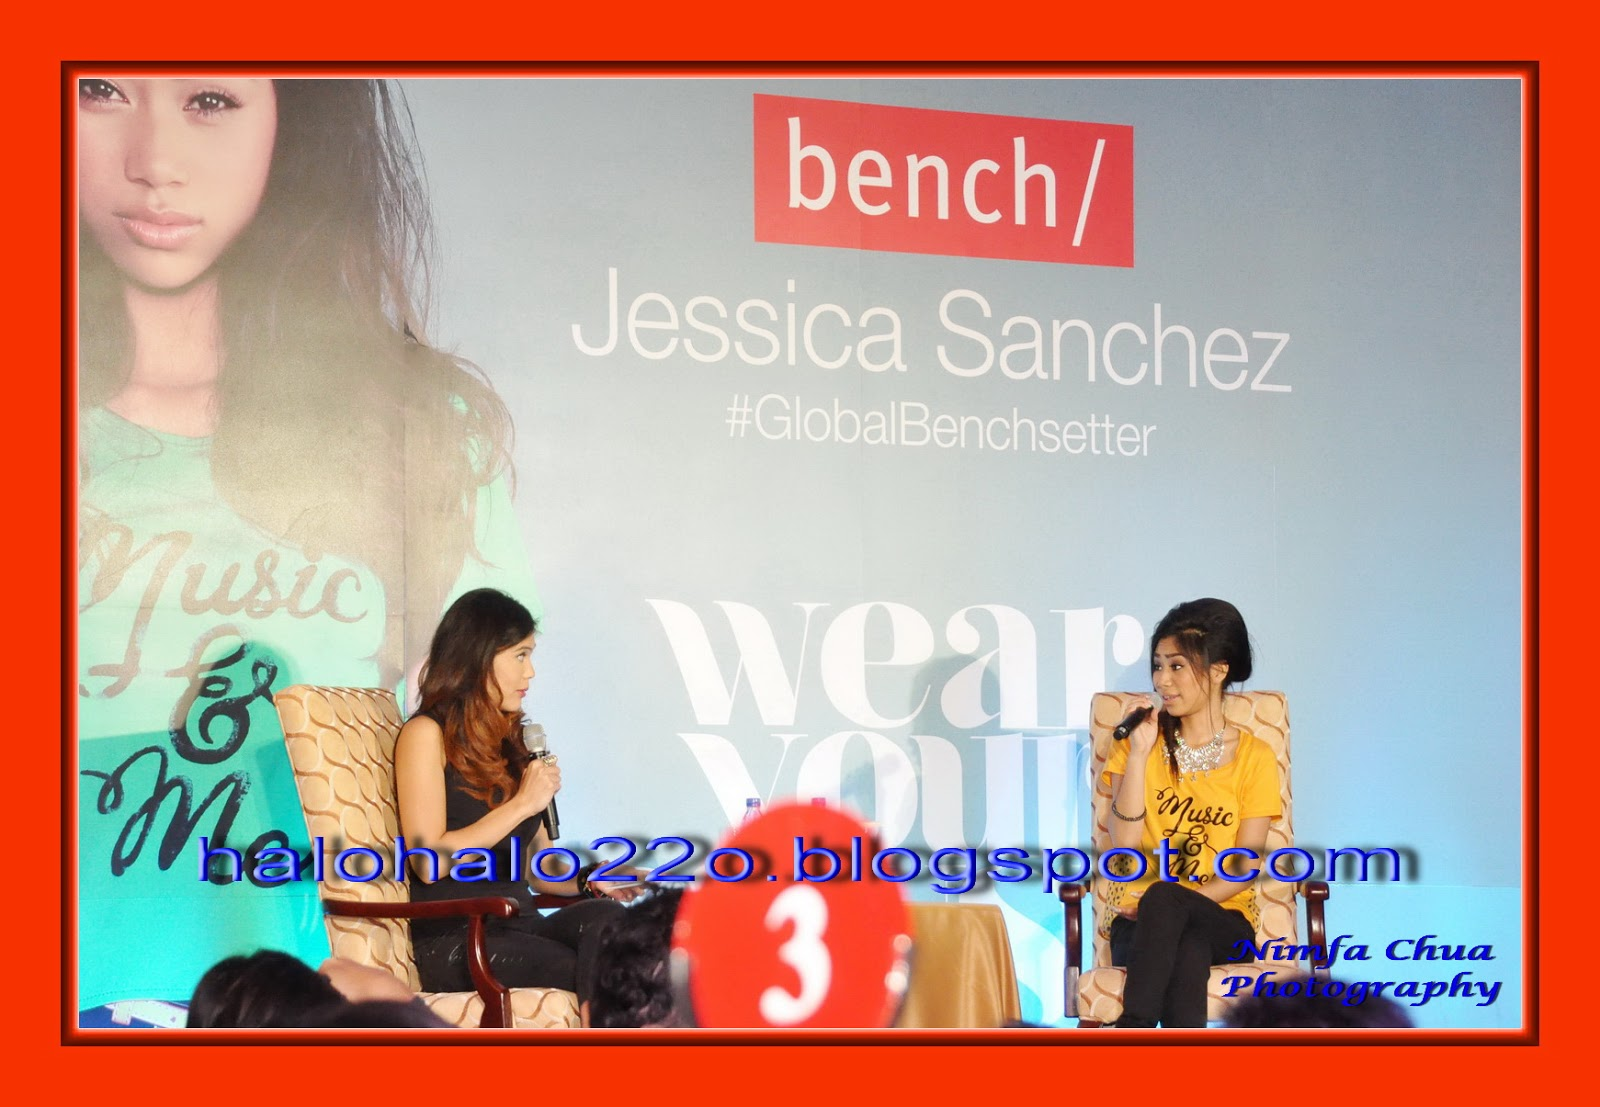 halohalo22o: Jessica S...